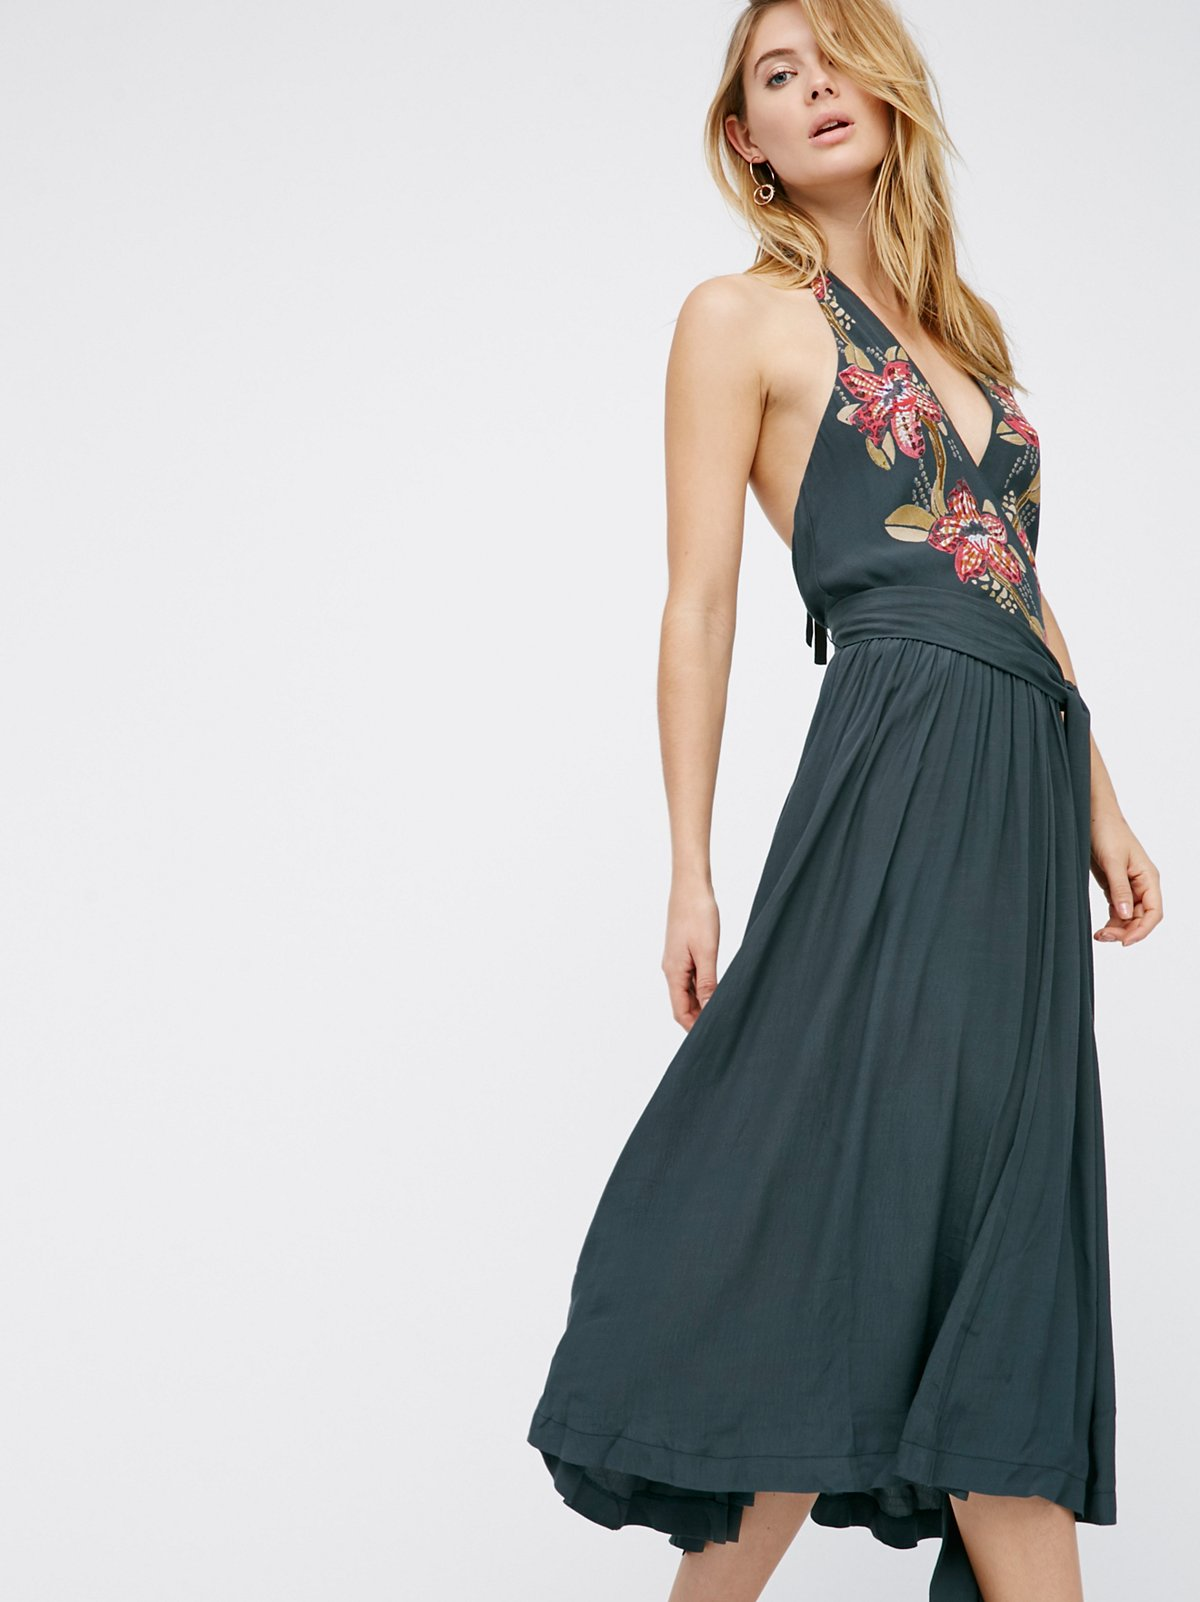 Get In Line Floral Midi